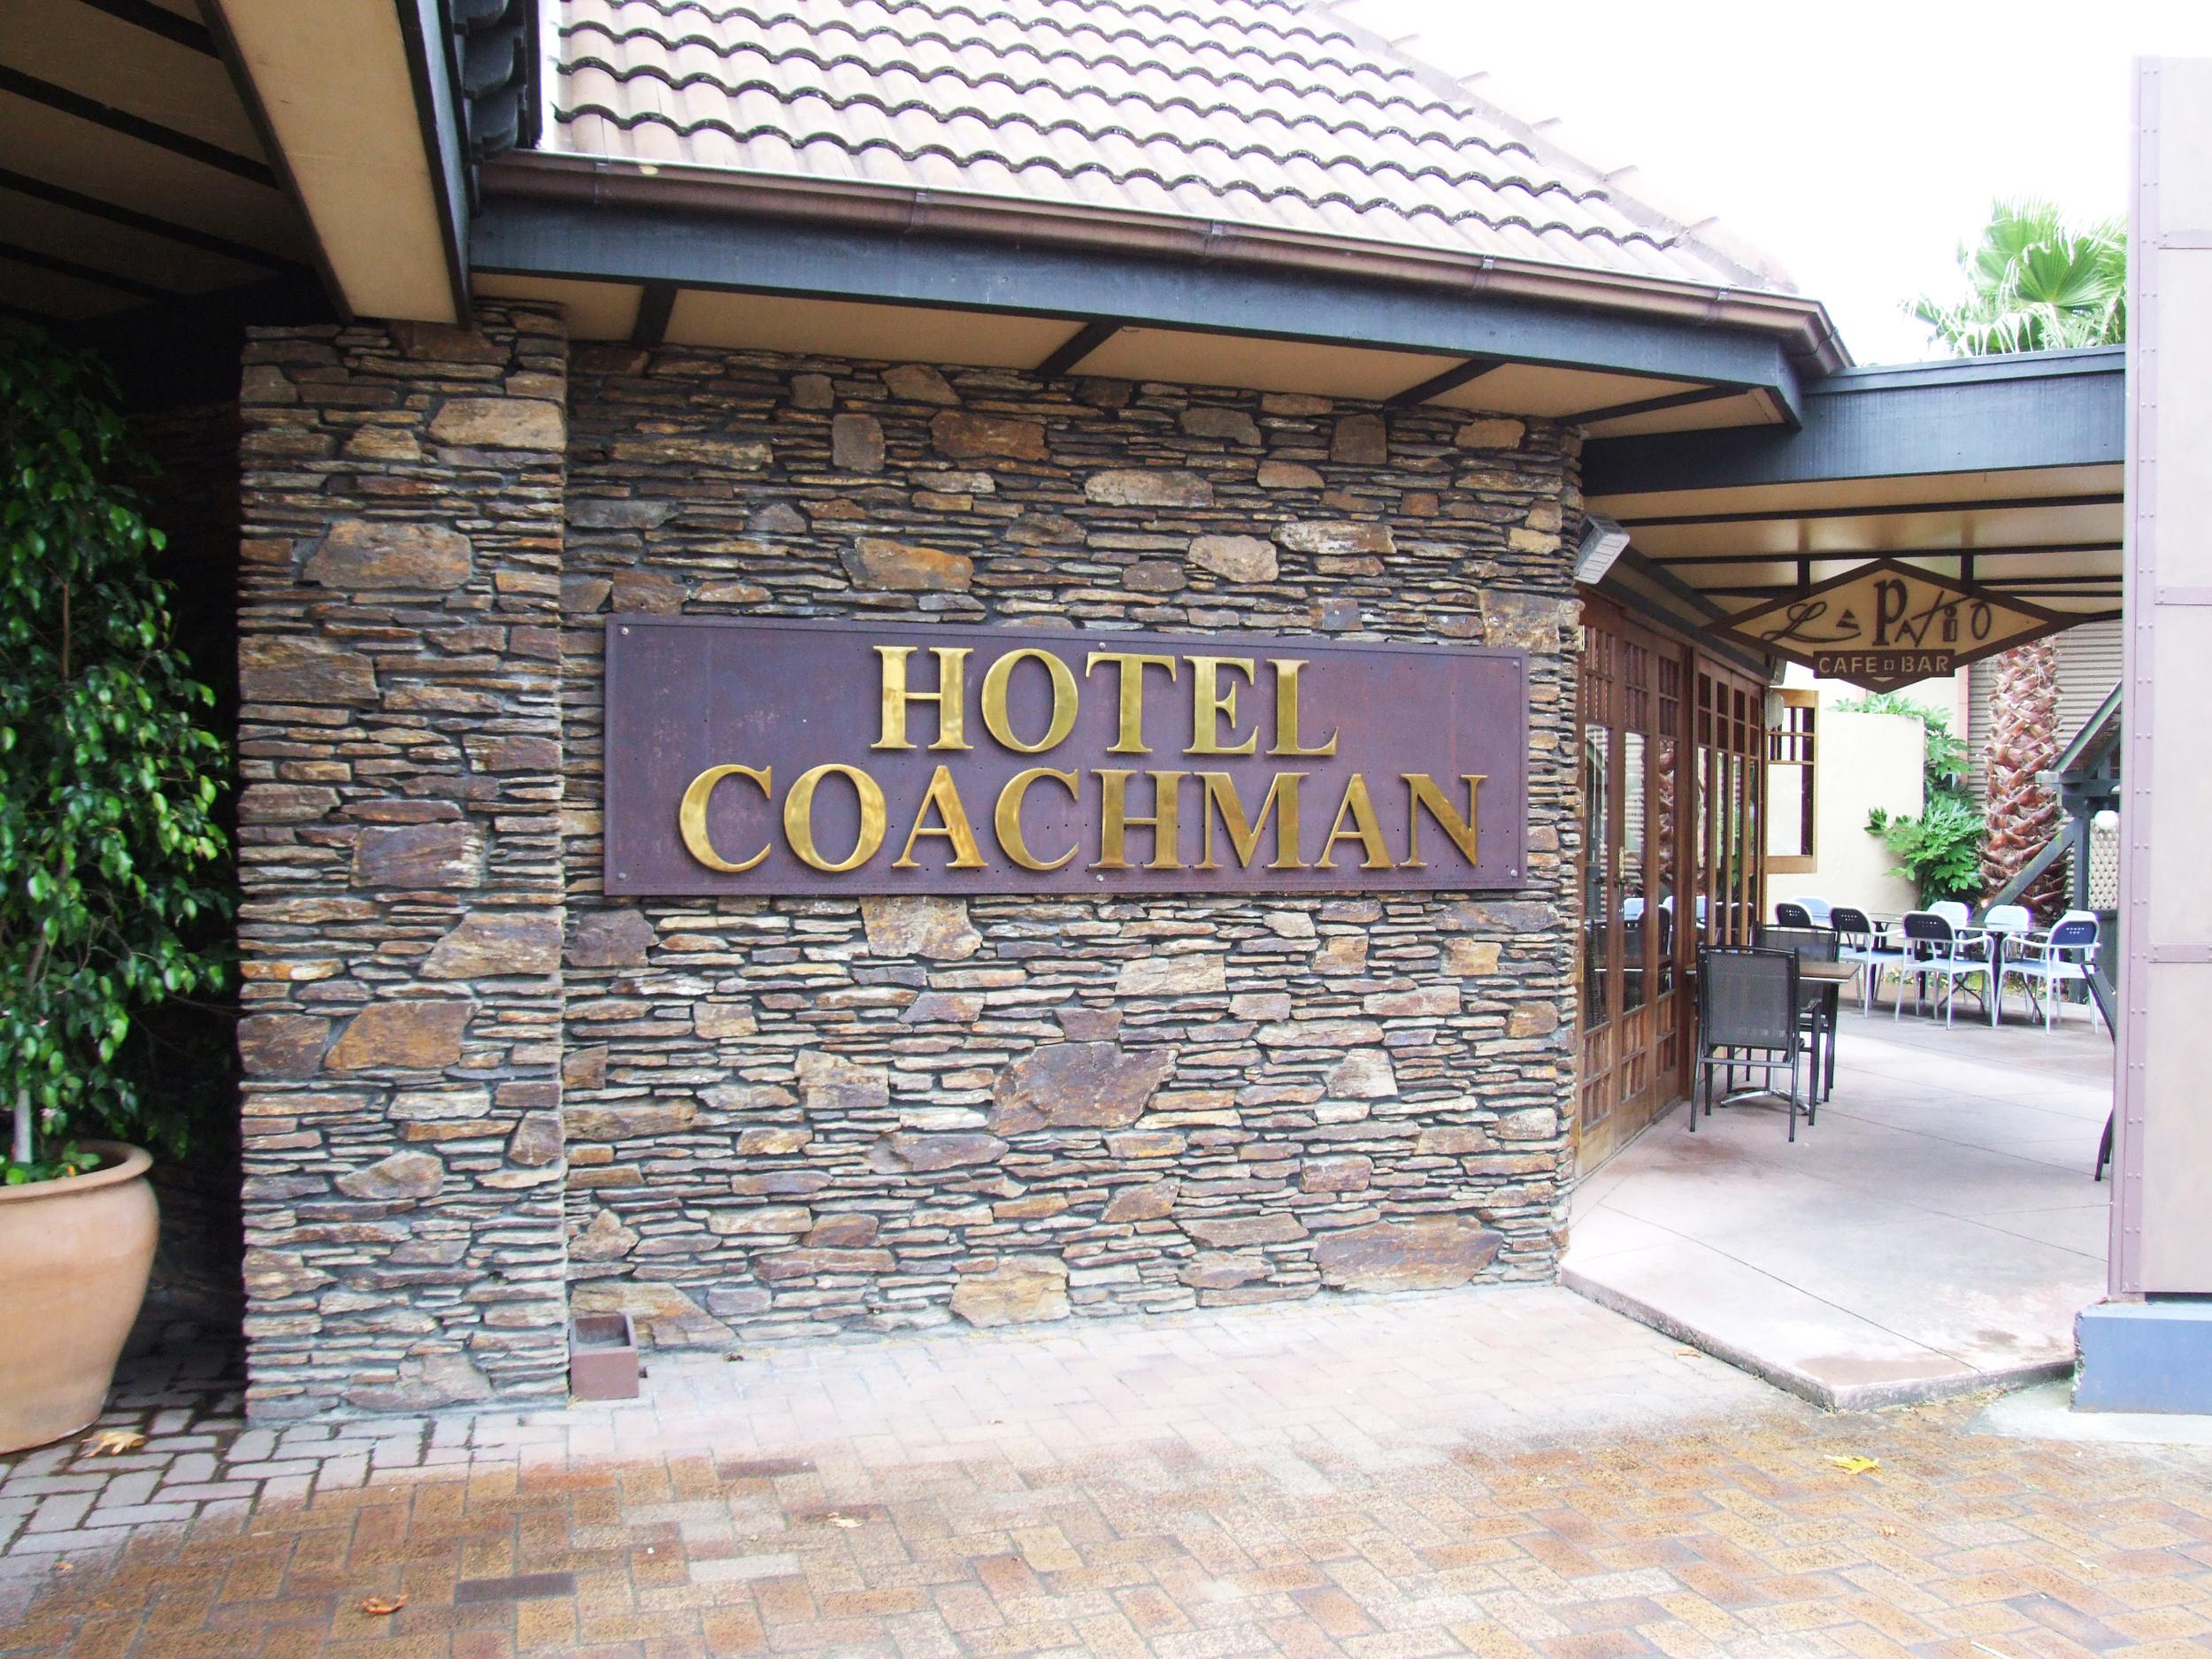 Hotel Coachman Exterior 6.jpg